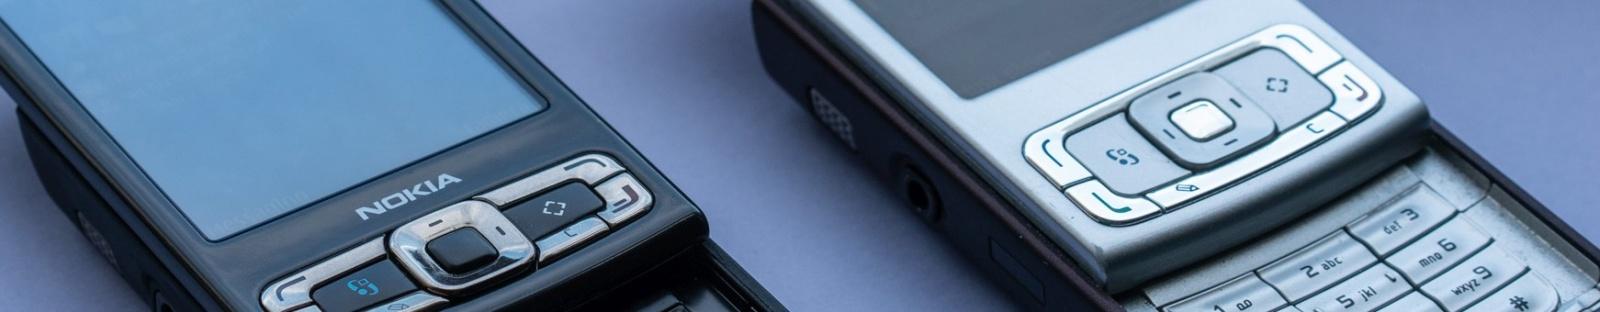 Nokia N95, лучший смартфон старой школы - 1